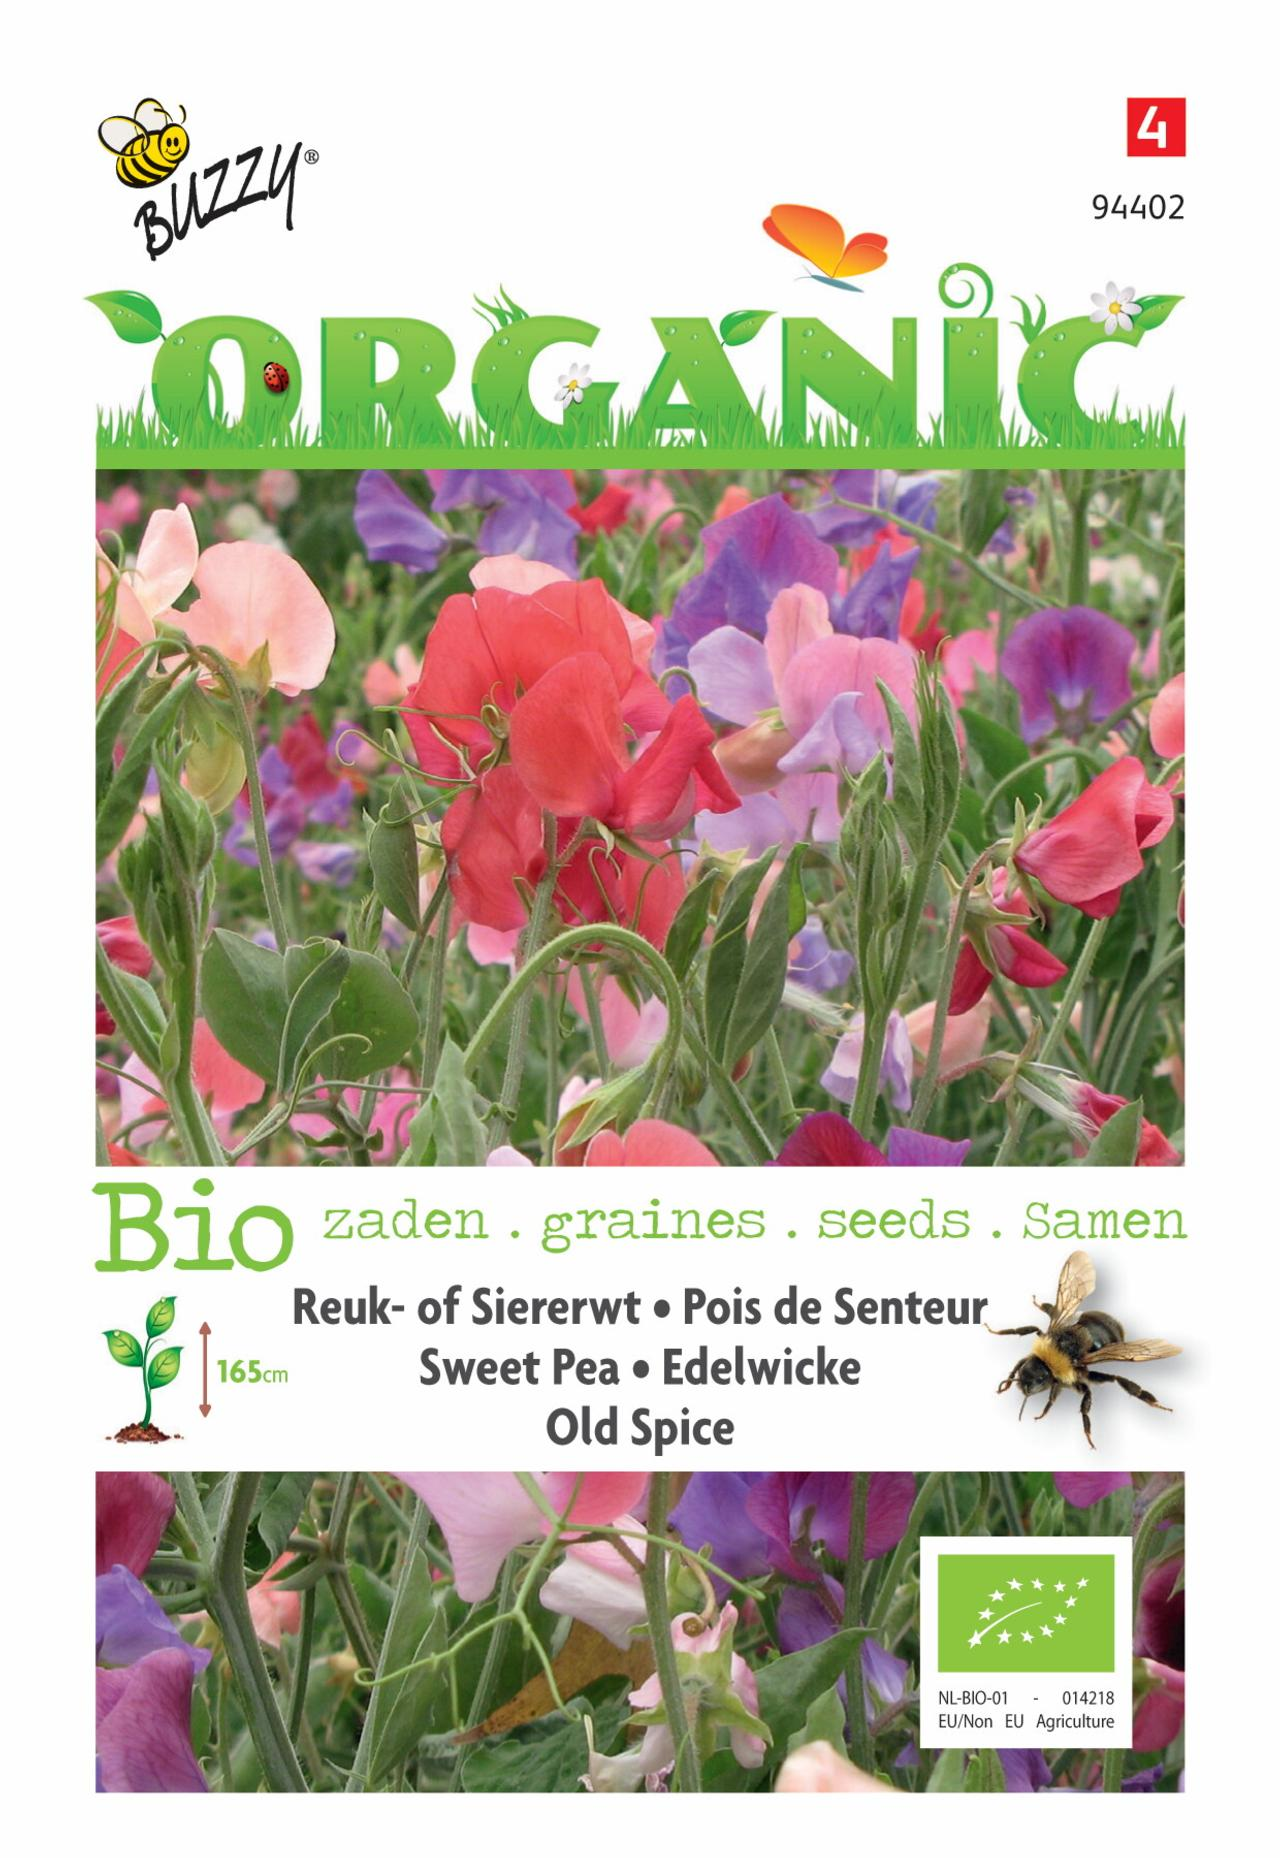 Lathyrus odoratus 'Old Spice' (BIO) plant